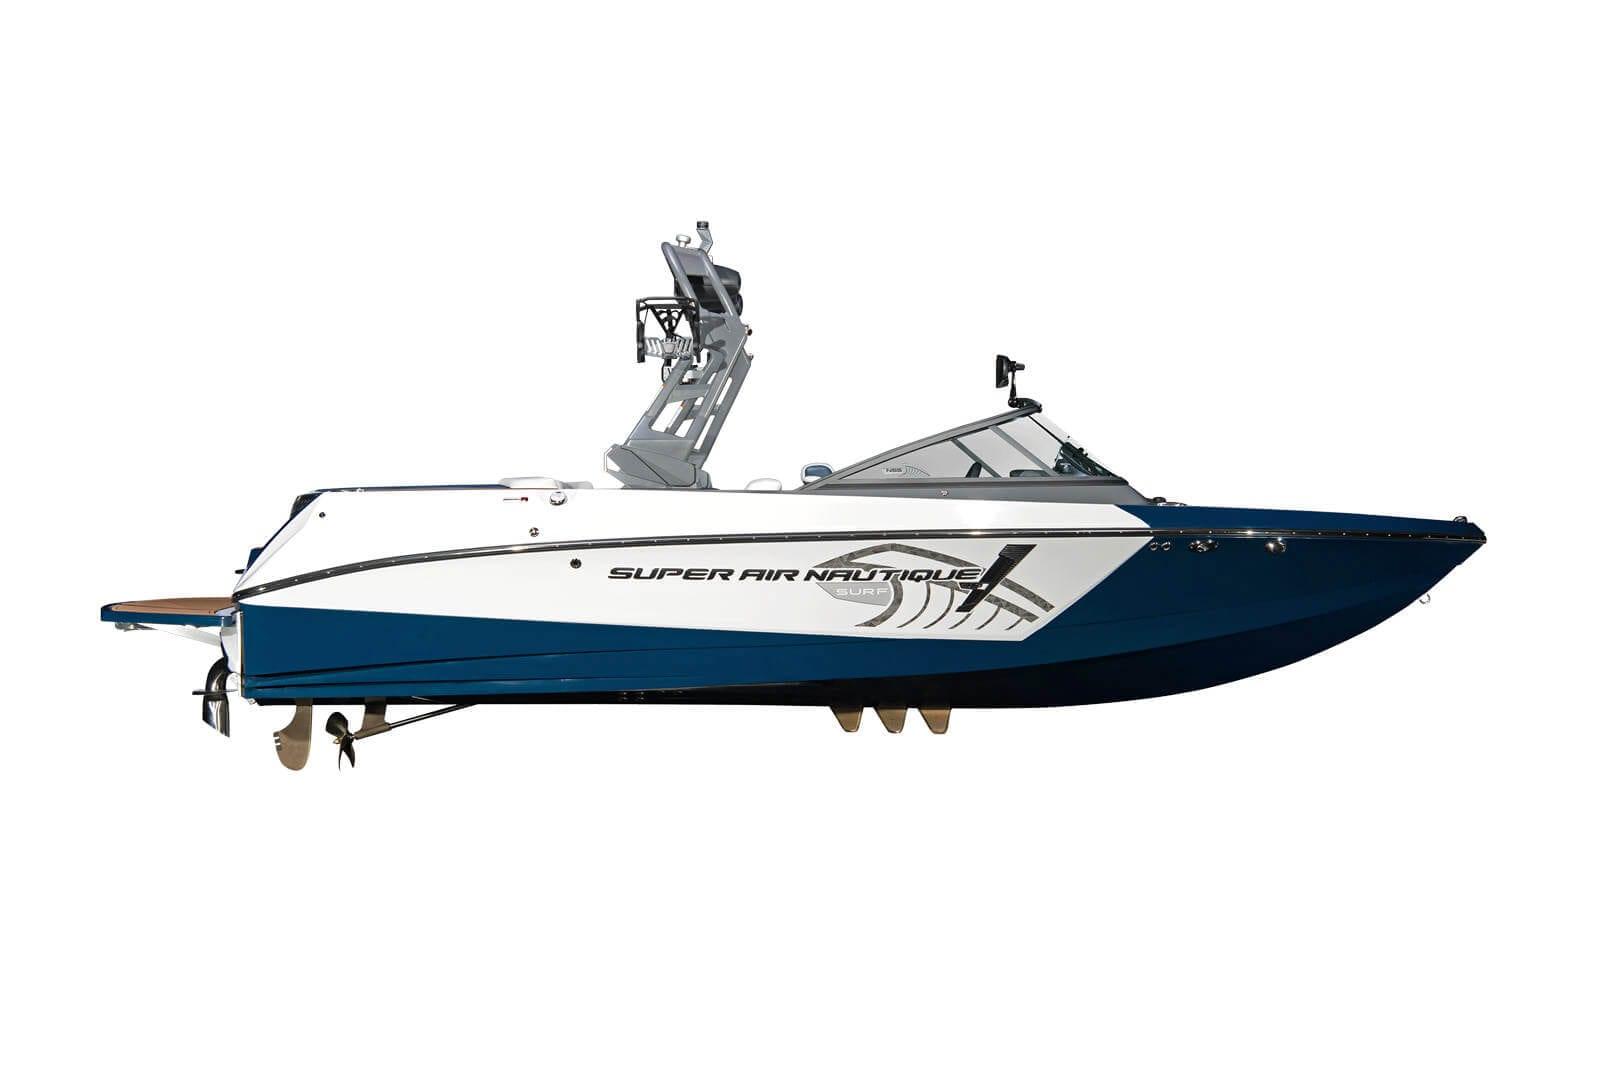 סירת ספורט - וויקסרף וויקבורד NAUTIQUE 210 - סטרים יאכטות